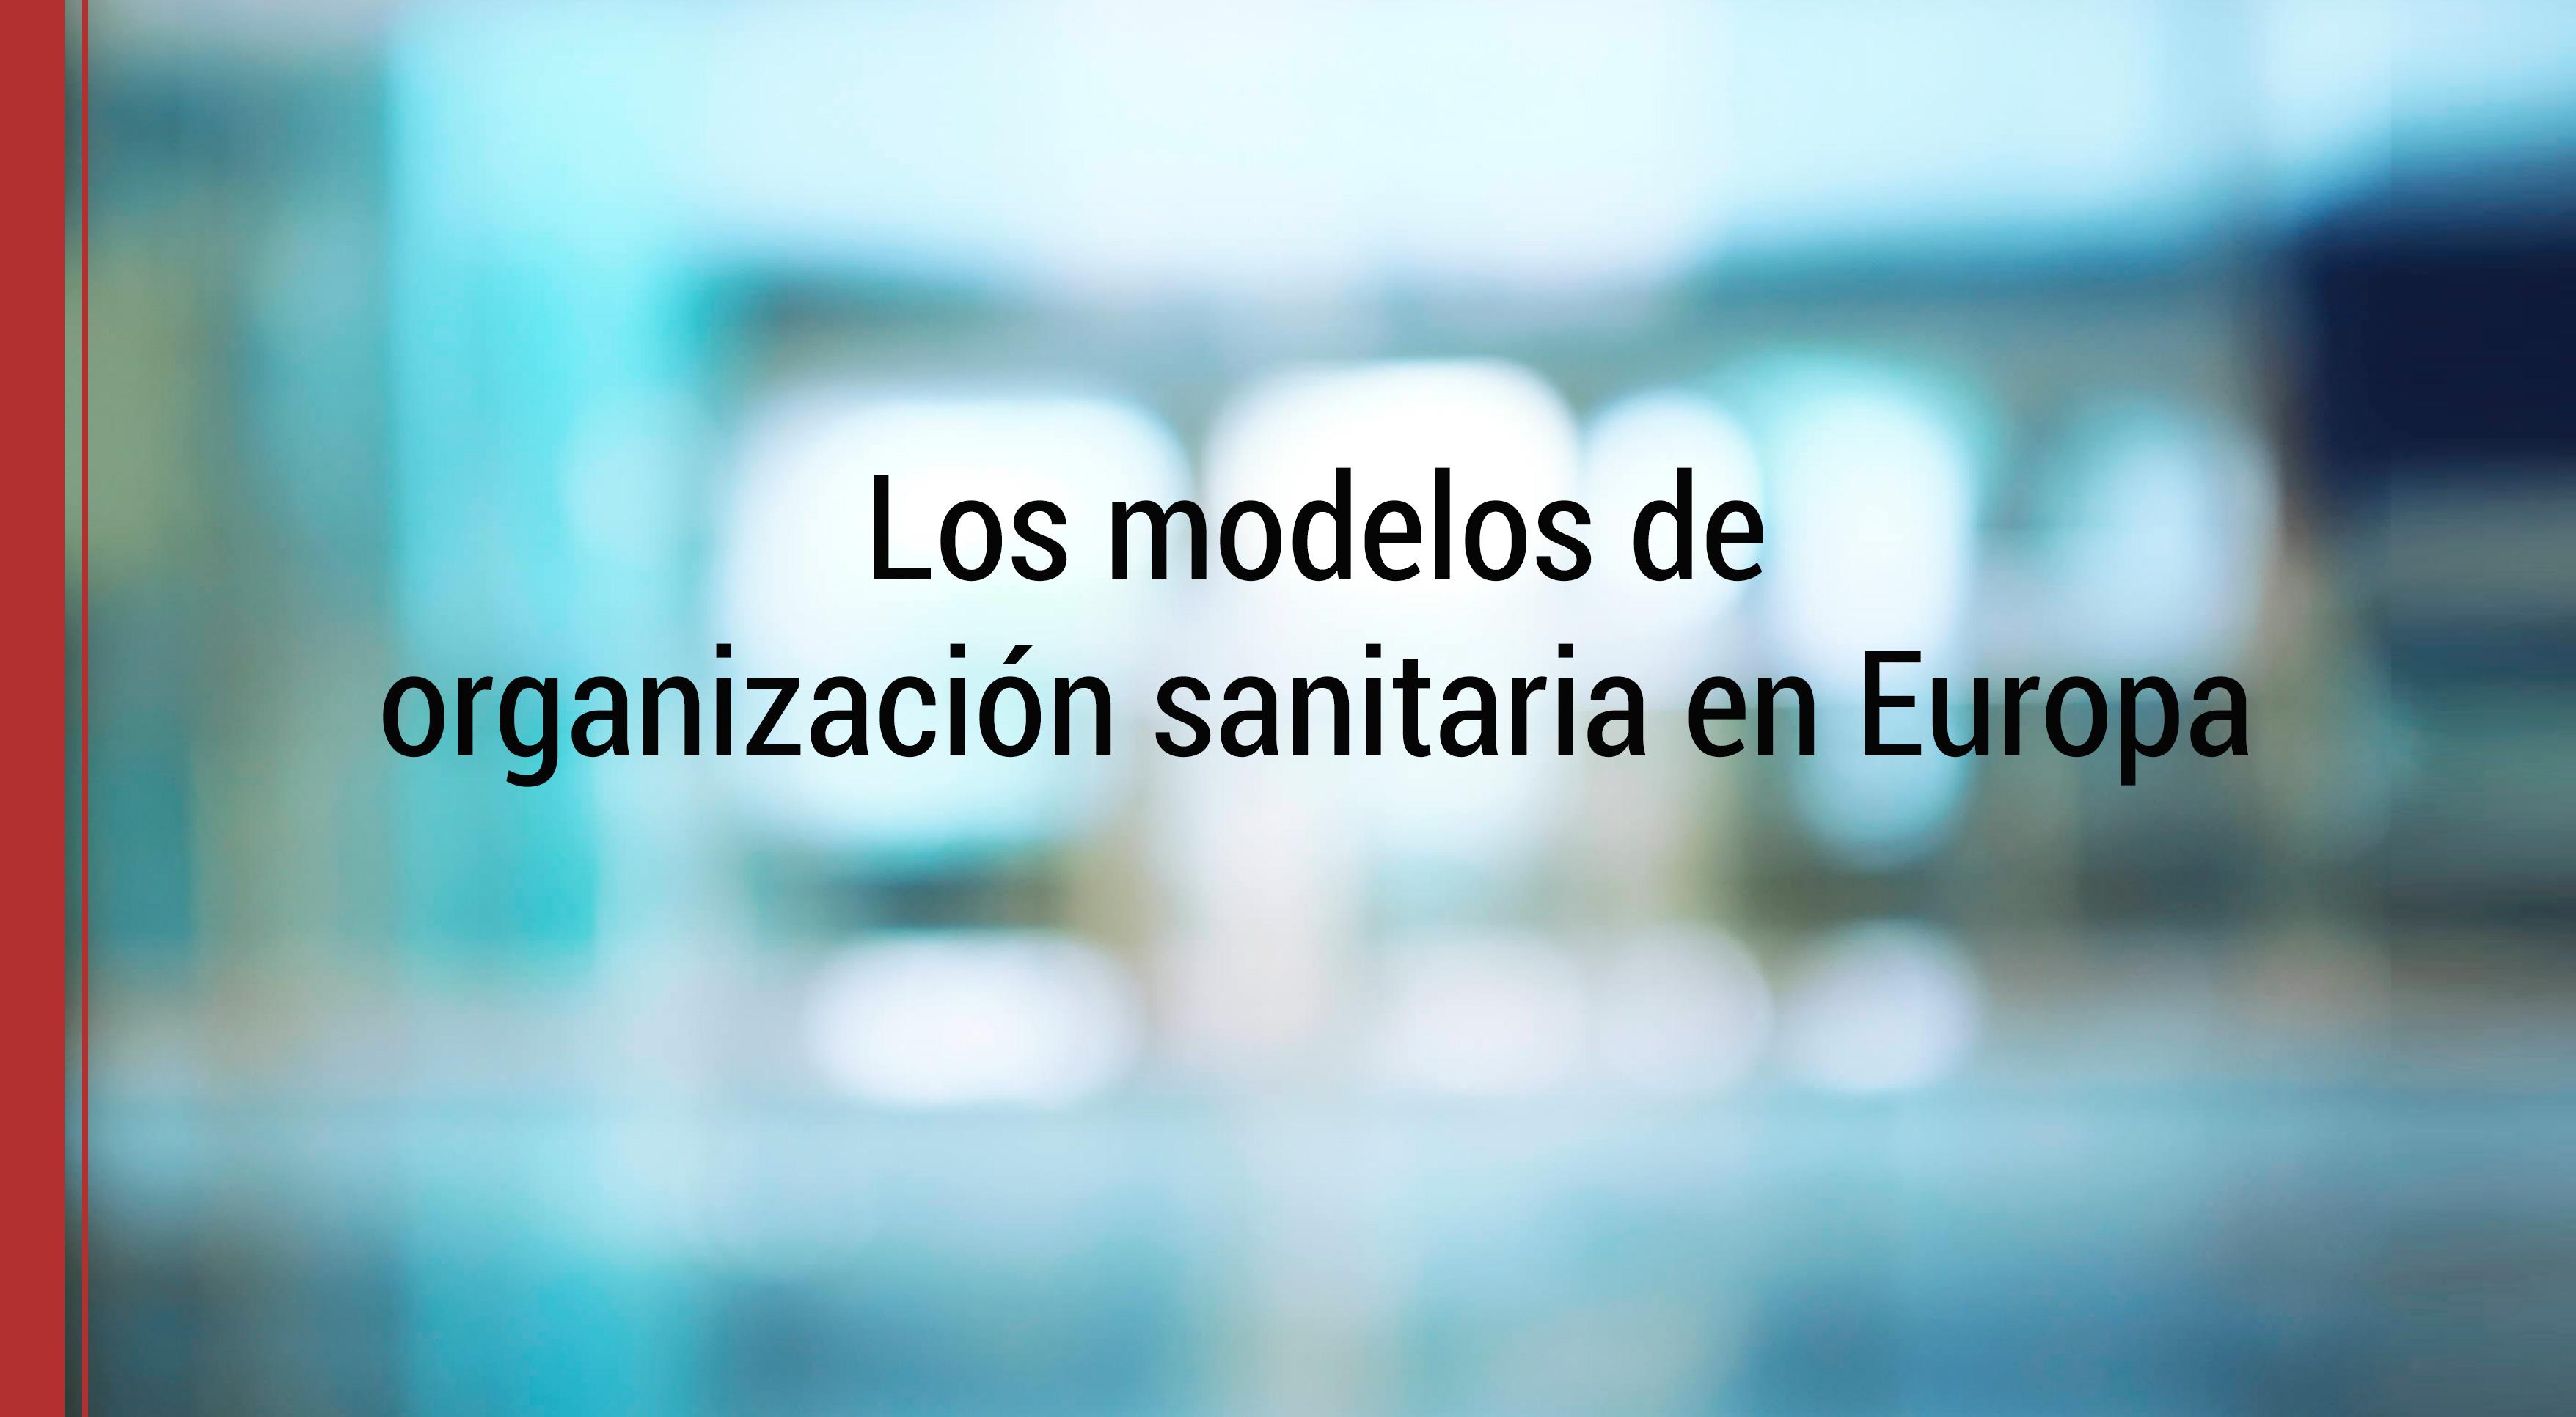 modelos-organizacion-sanitaria-europa Los modelos de organizaciones sanitarias en Europa